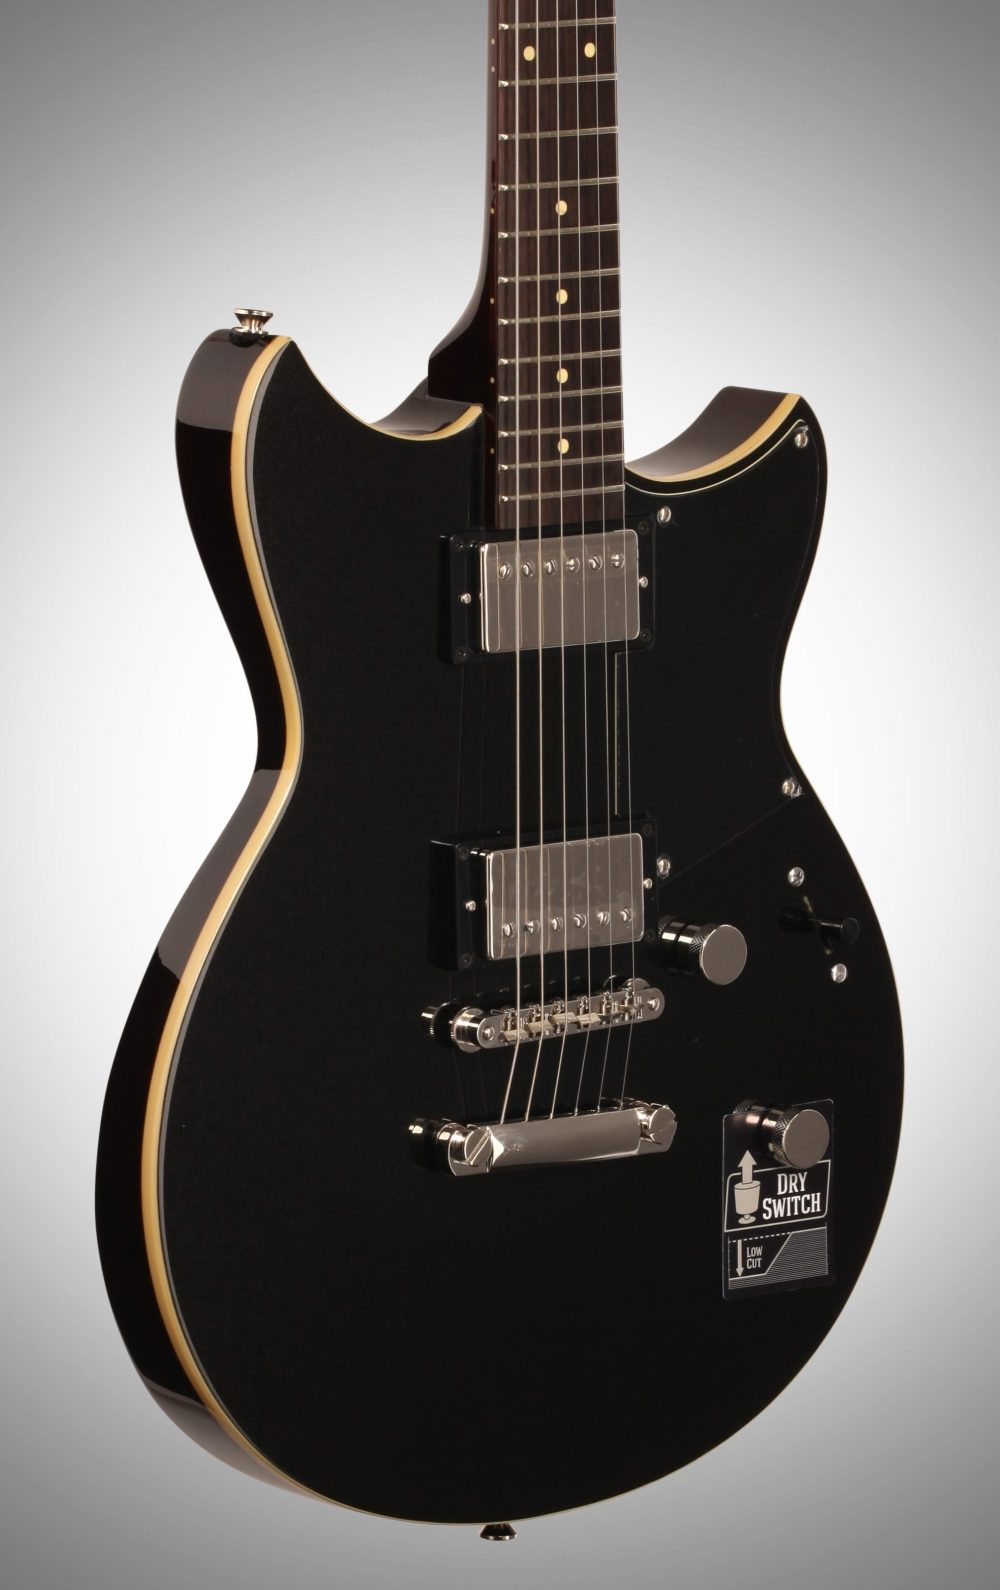 medium resolution of  yamaha revstar rs420 electric guitar black steel full left front